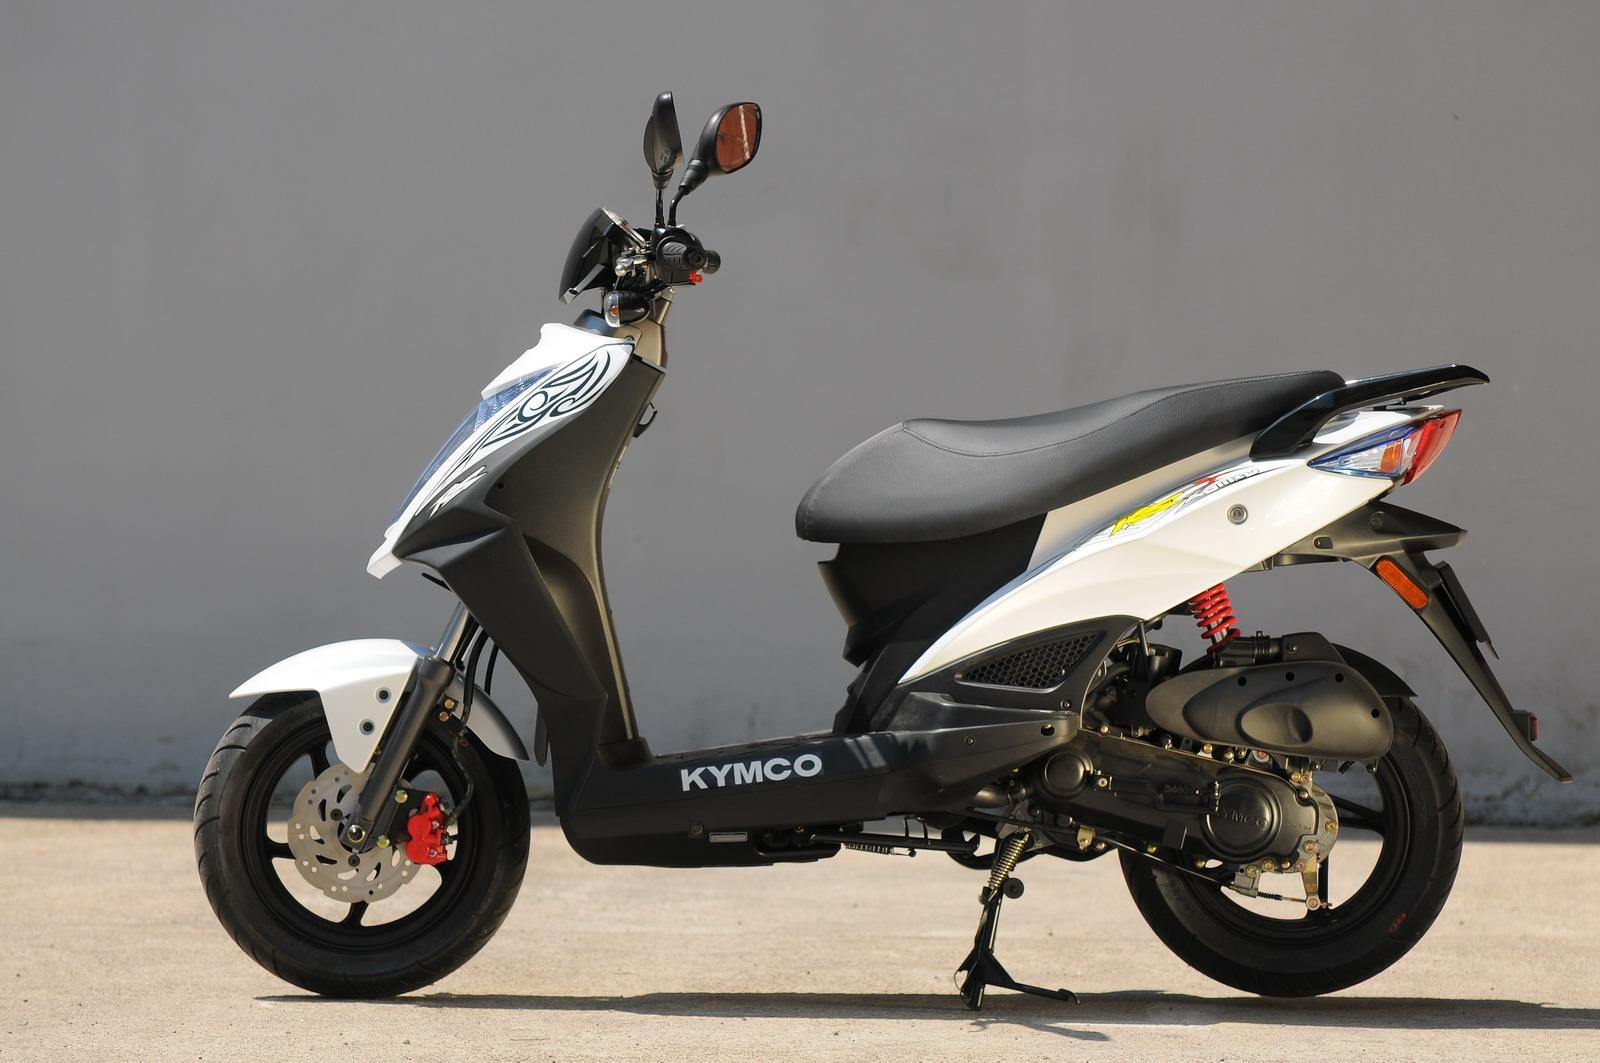 Kymco Agility RS Naked - Alle technischen Daten zum Modell